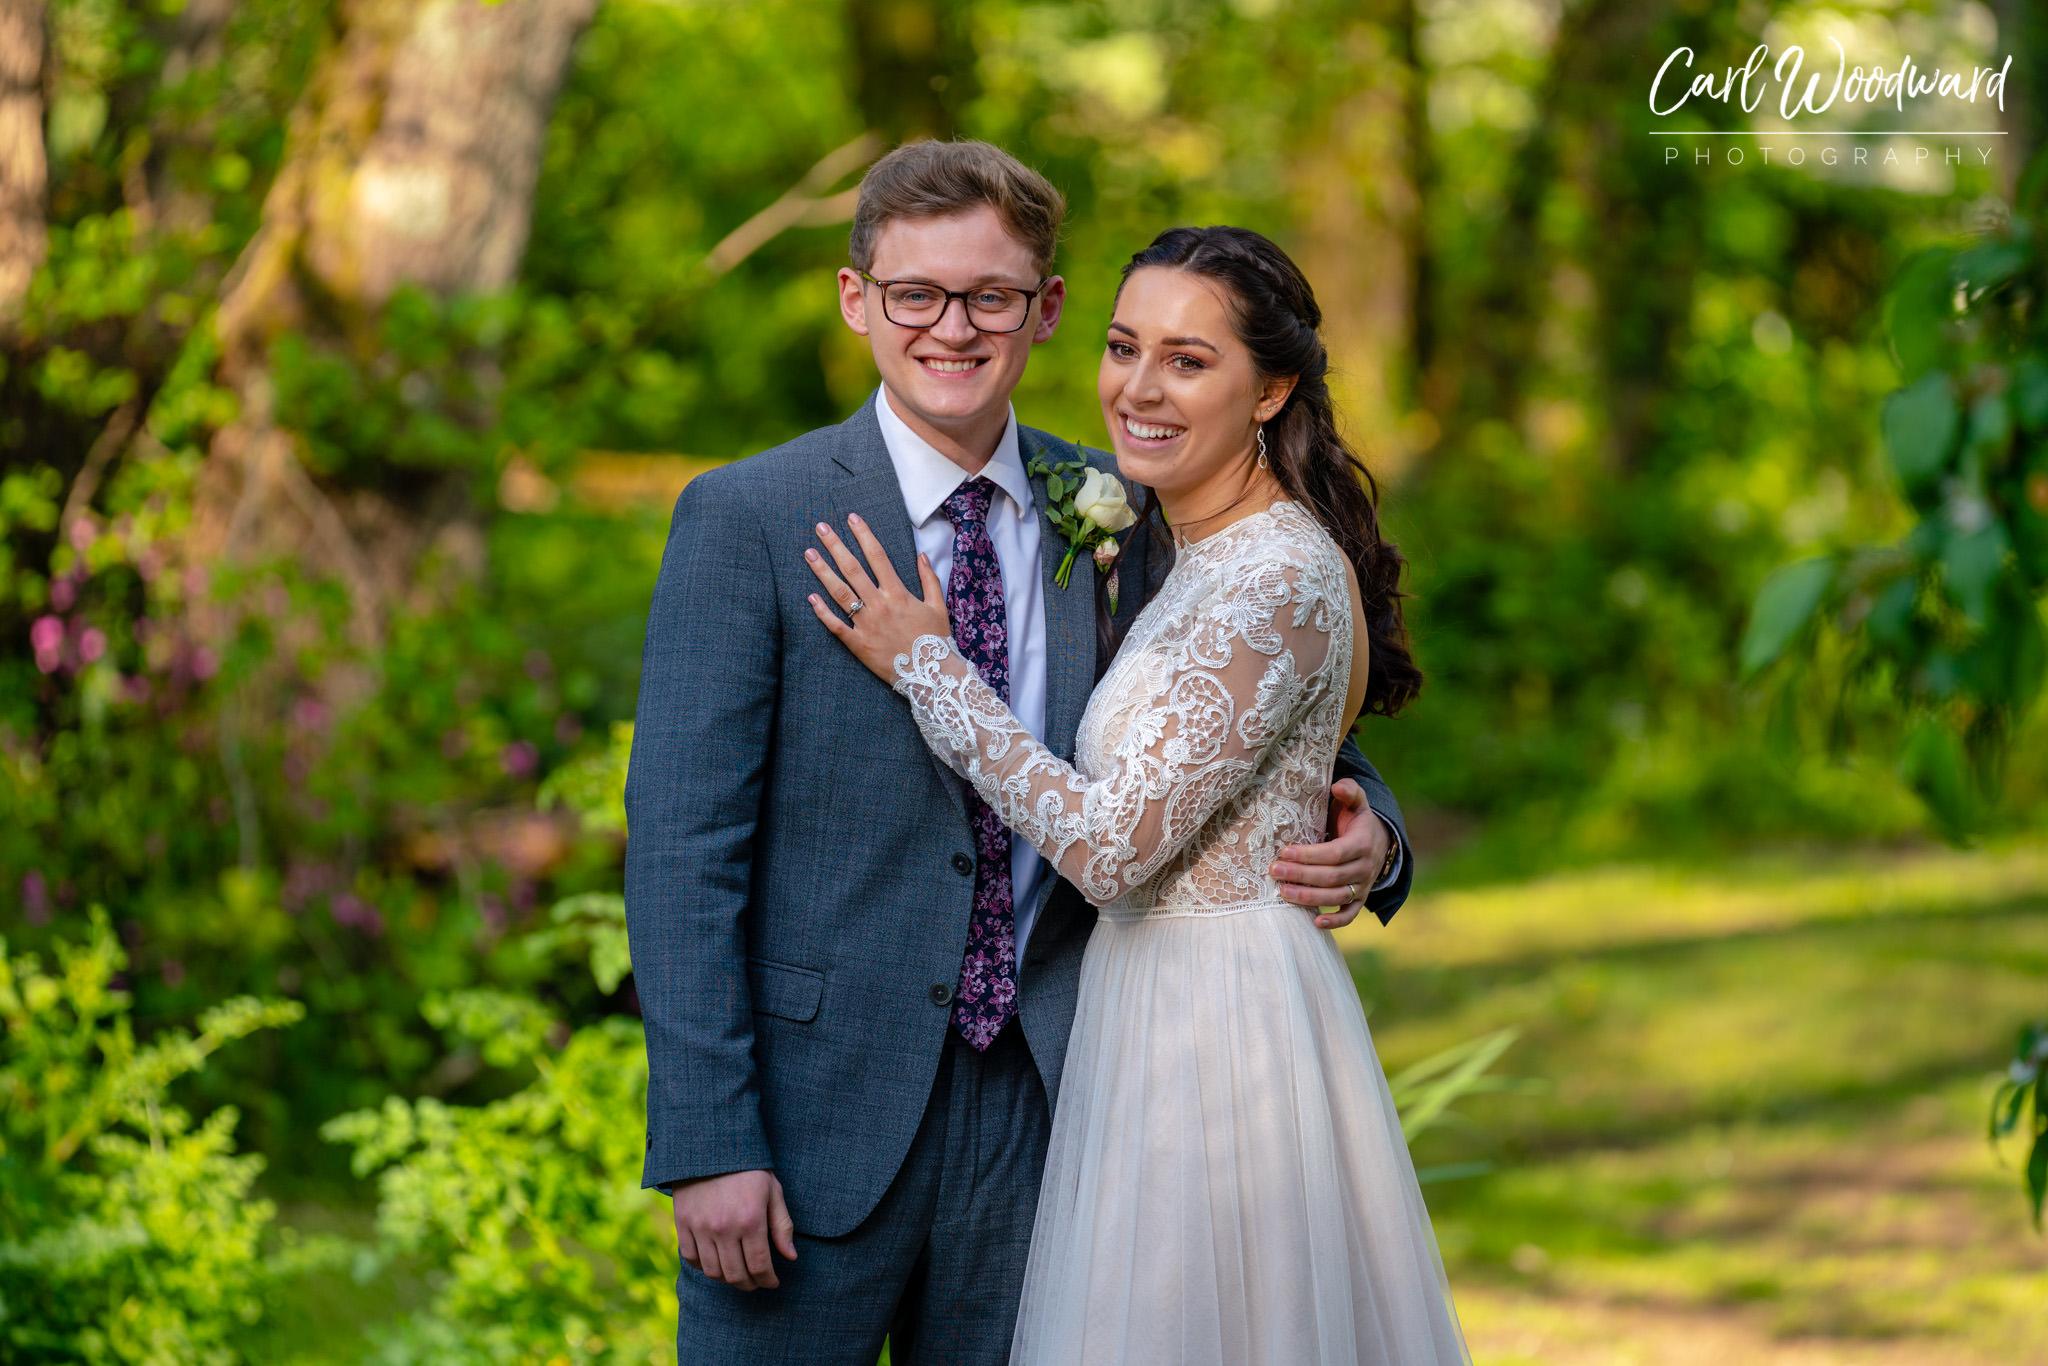 020-pencoed-house-estate-wedding-wedding-photography-cardiff-wedding-photographer.jpg